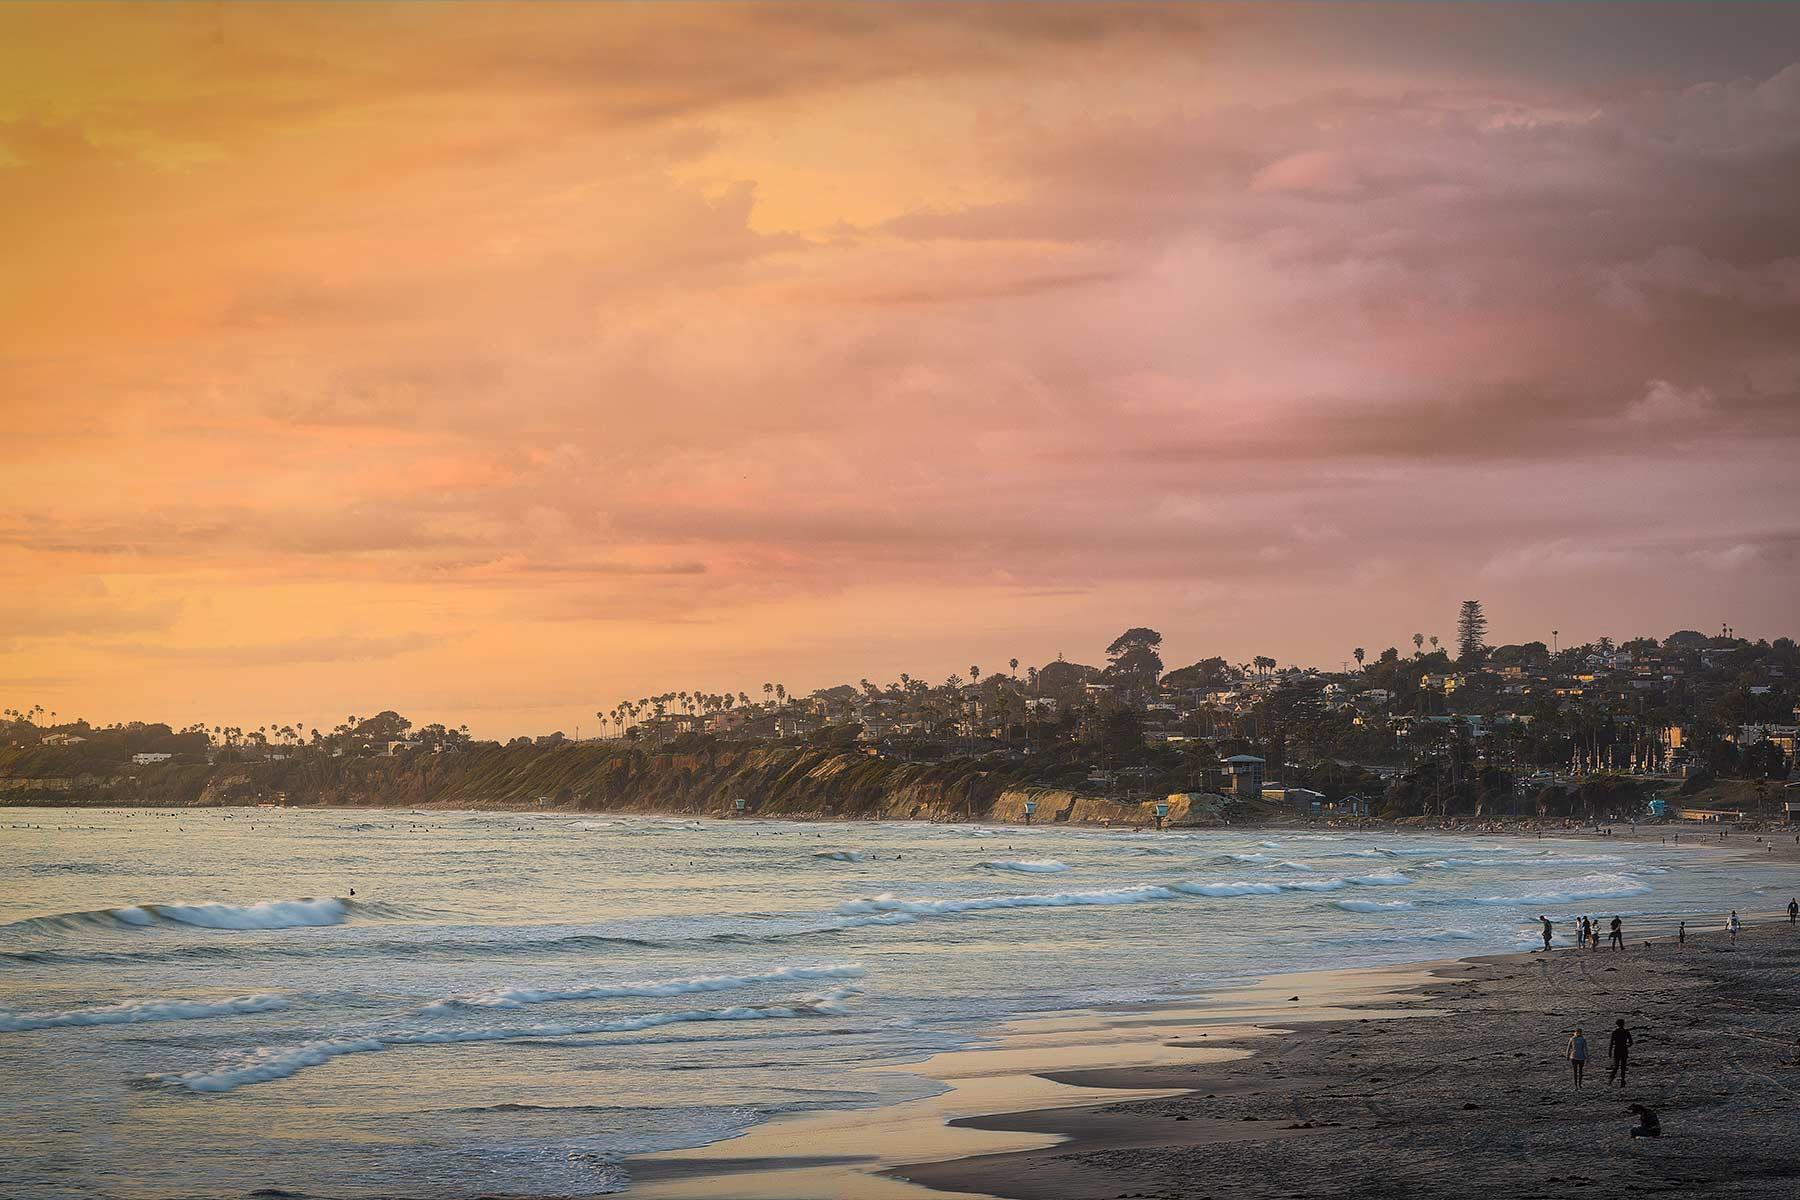 walking along solana beach during sunset